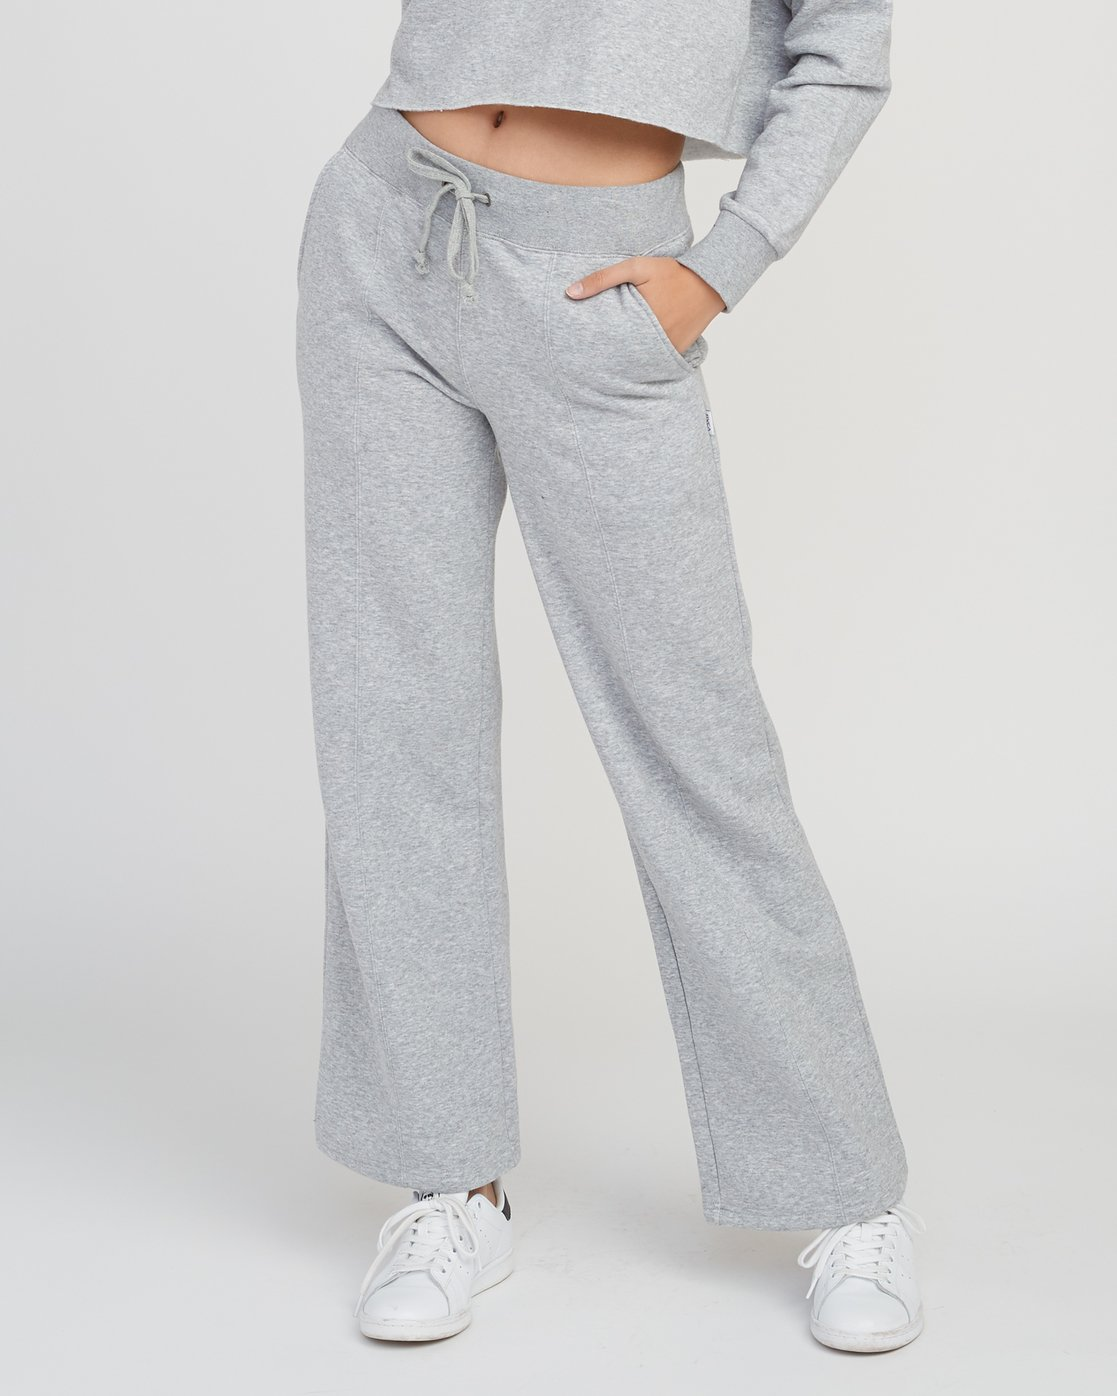 RVCA Womens Stakeit Wide Leg Fleece Pant